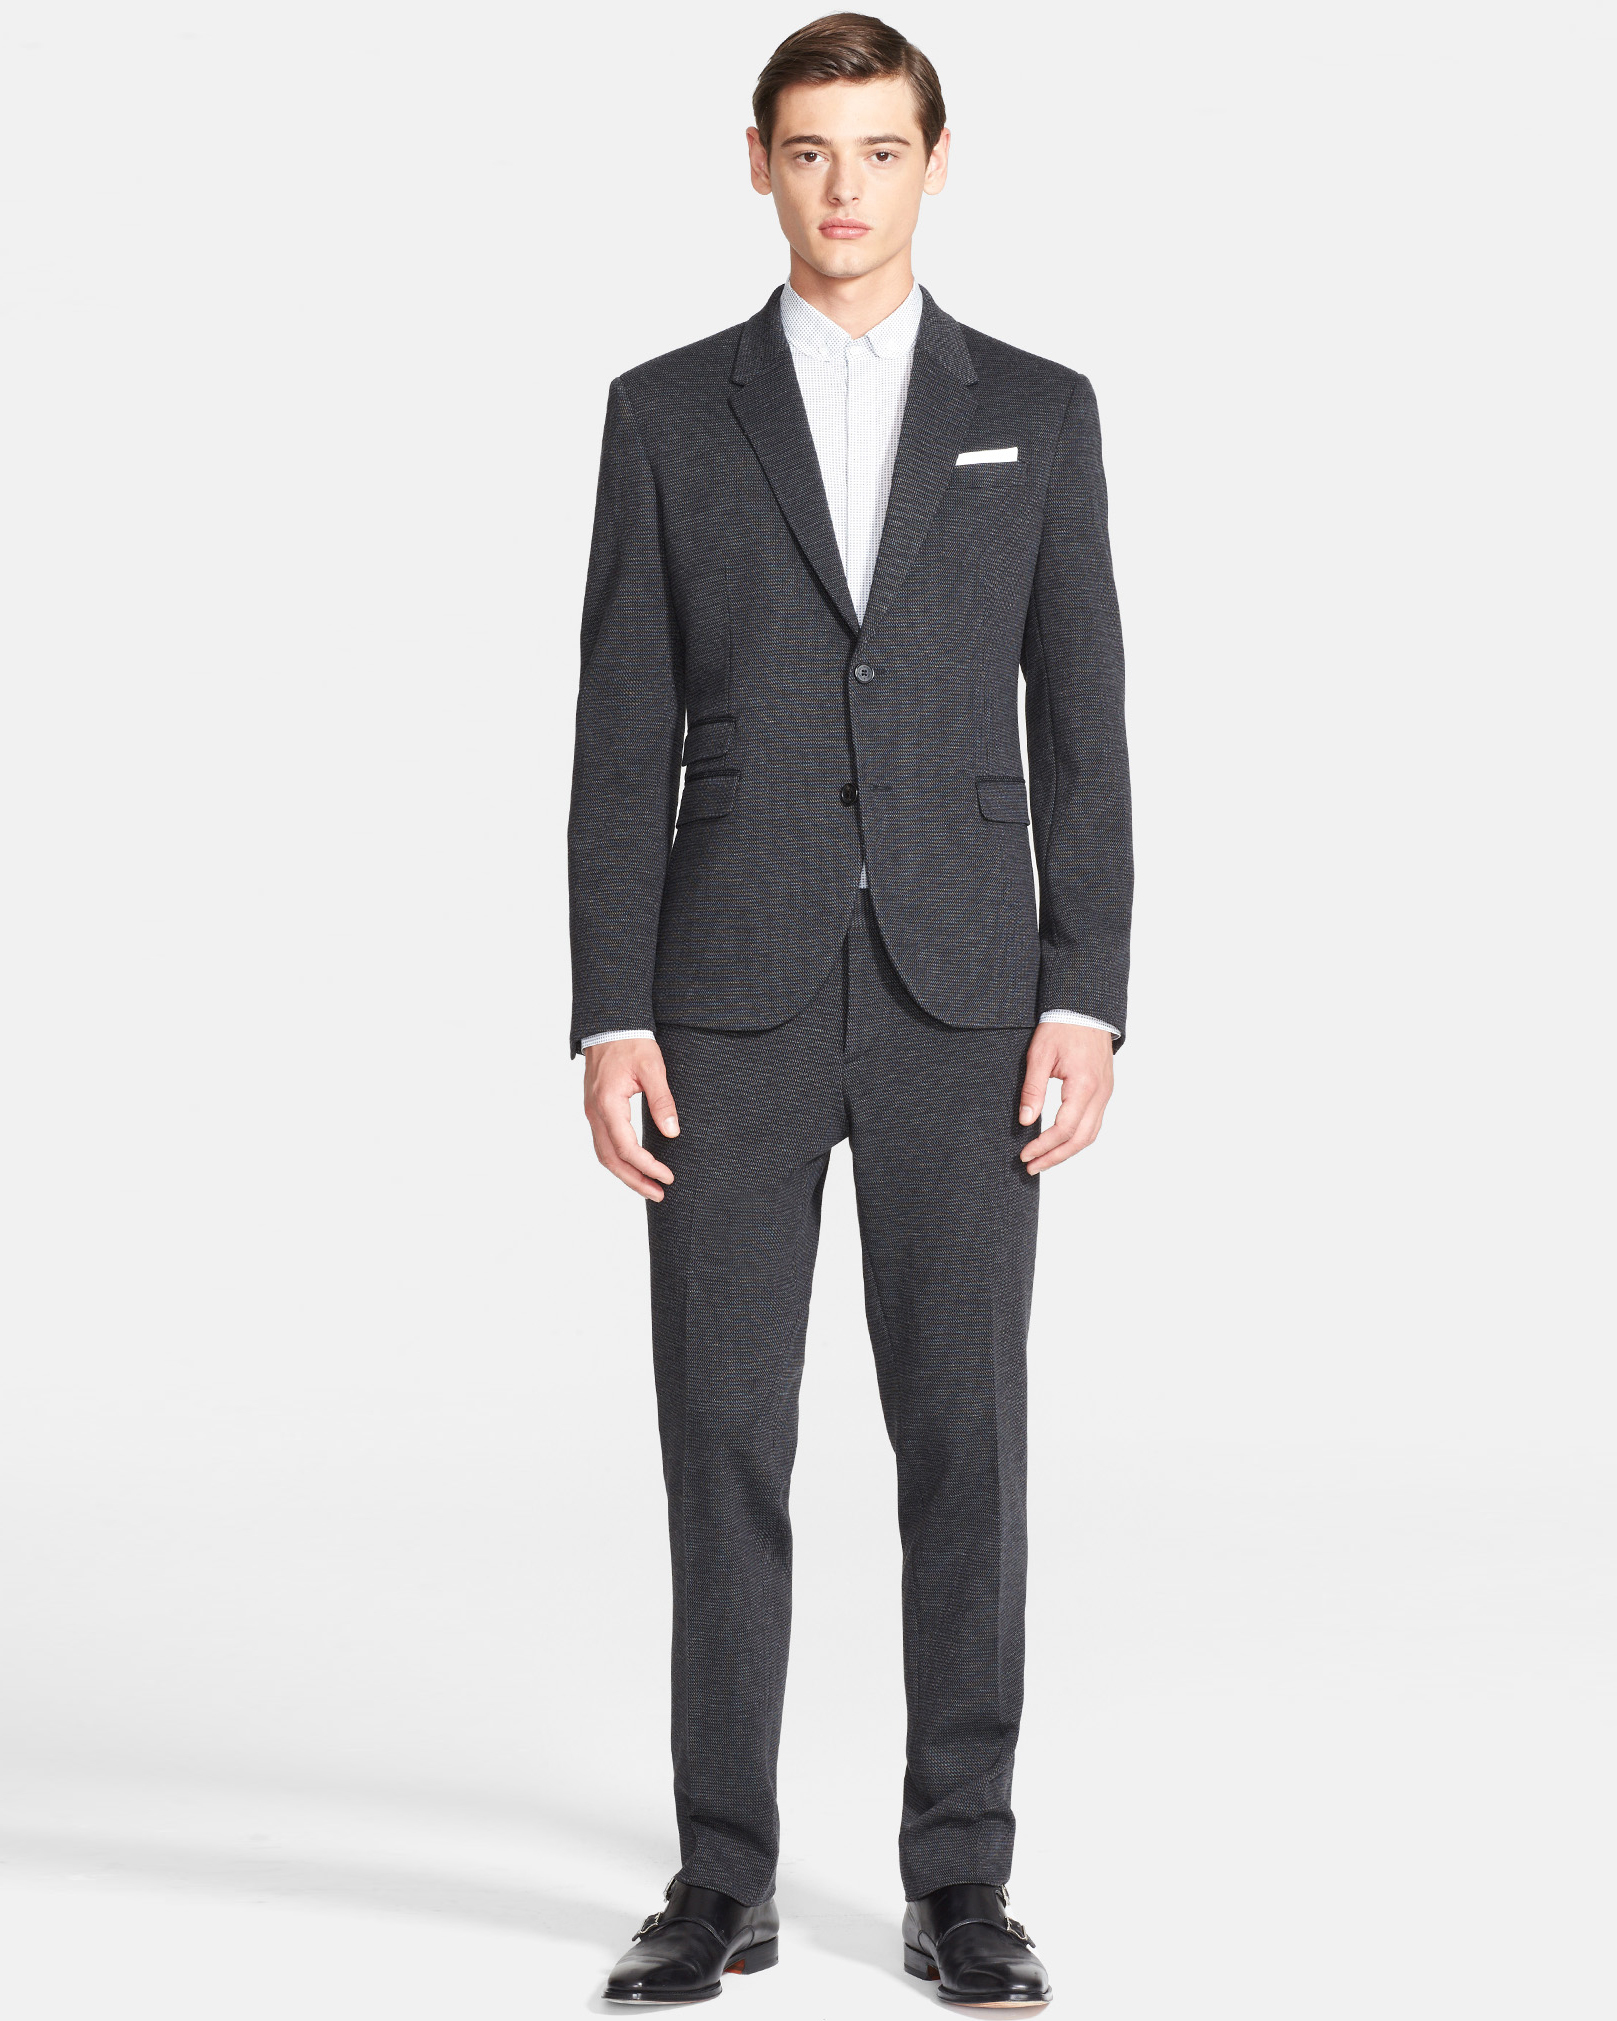 fall-groom-suits-nordstrom-neil-barrett-jersey-suit-1014.jpg